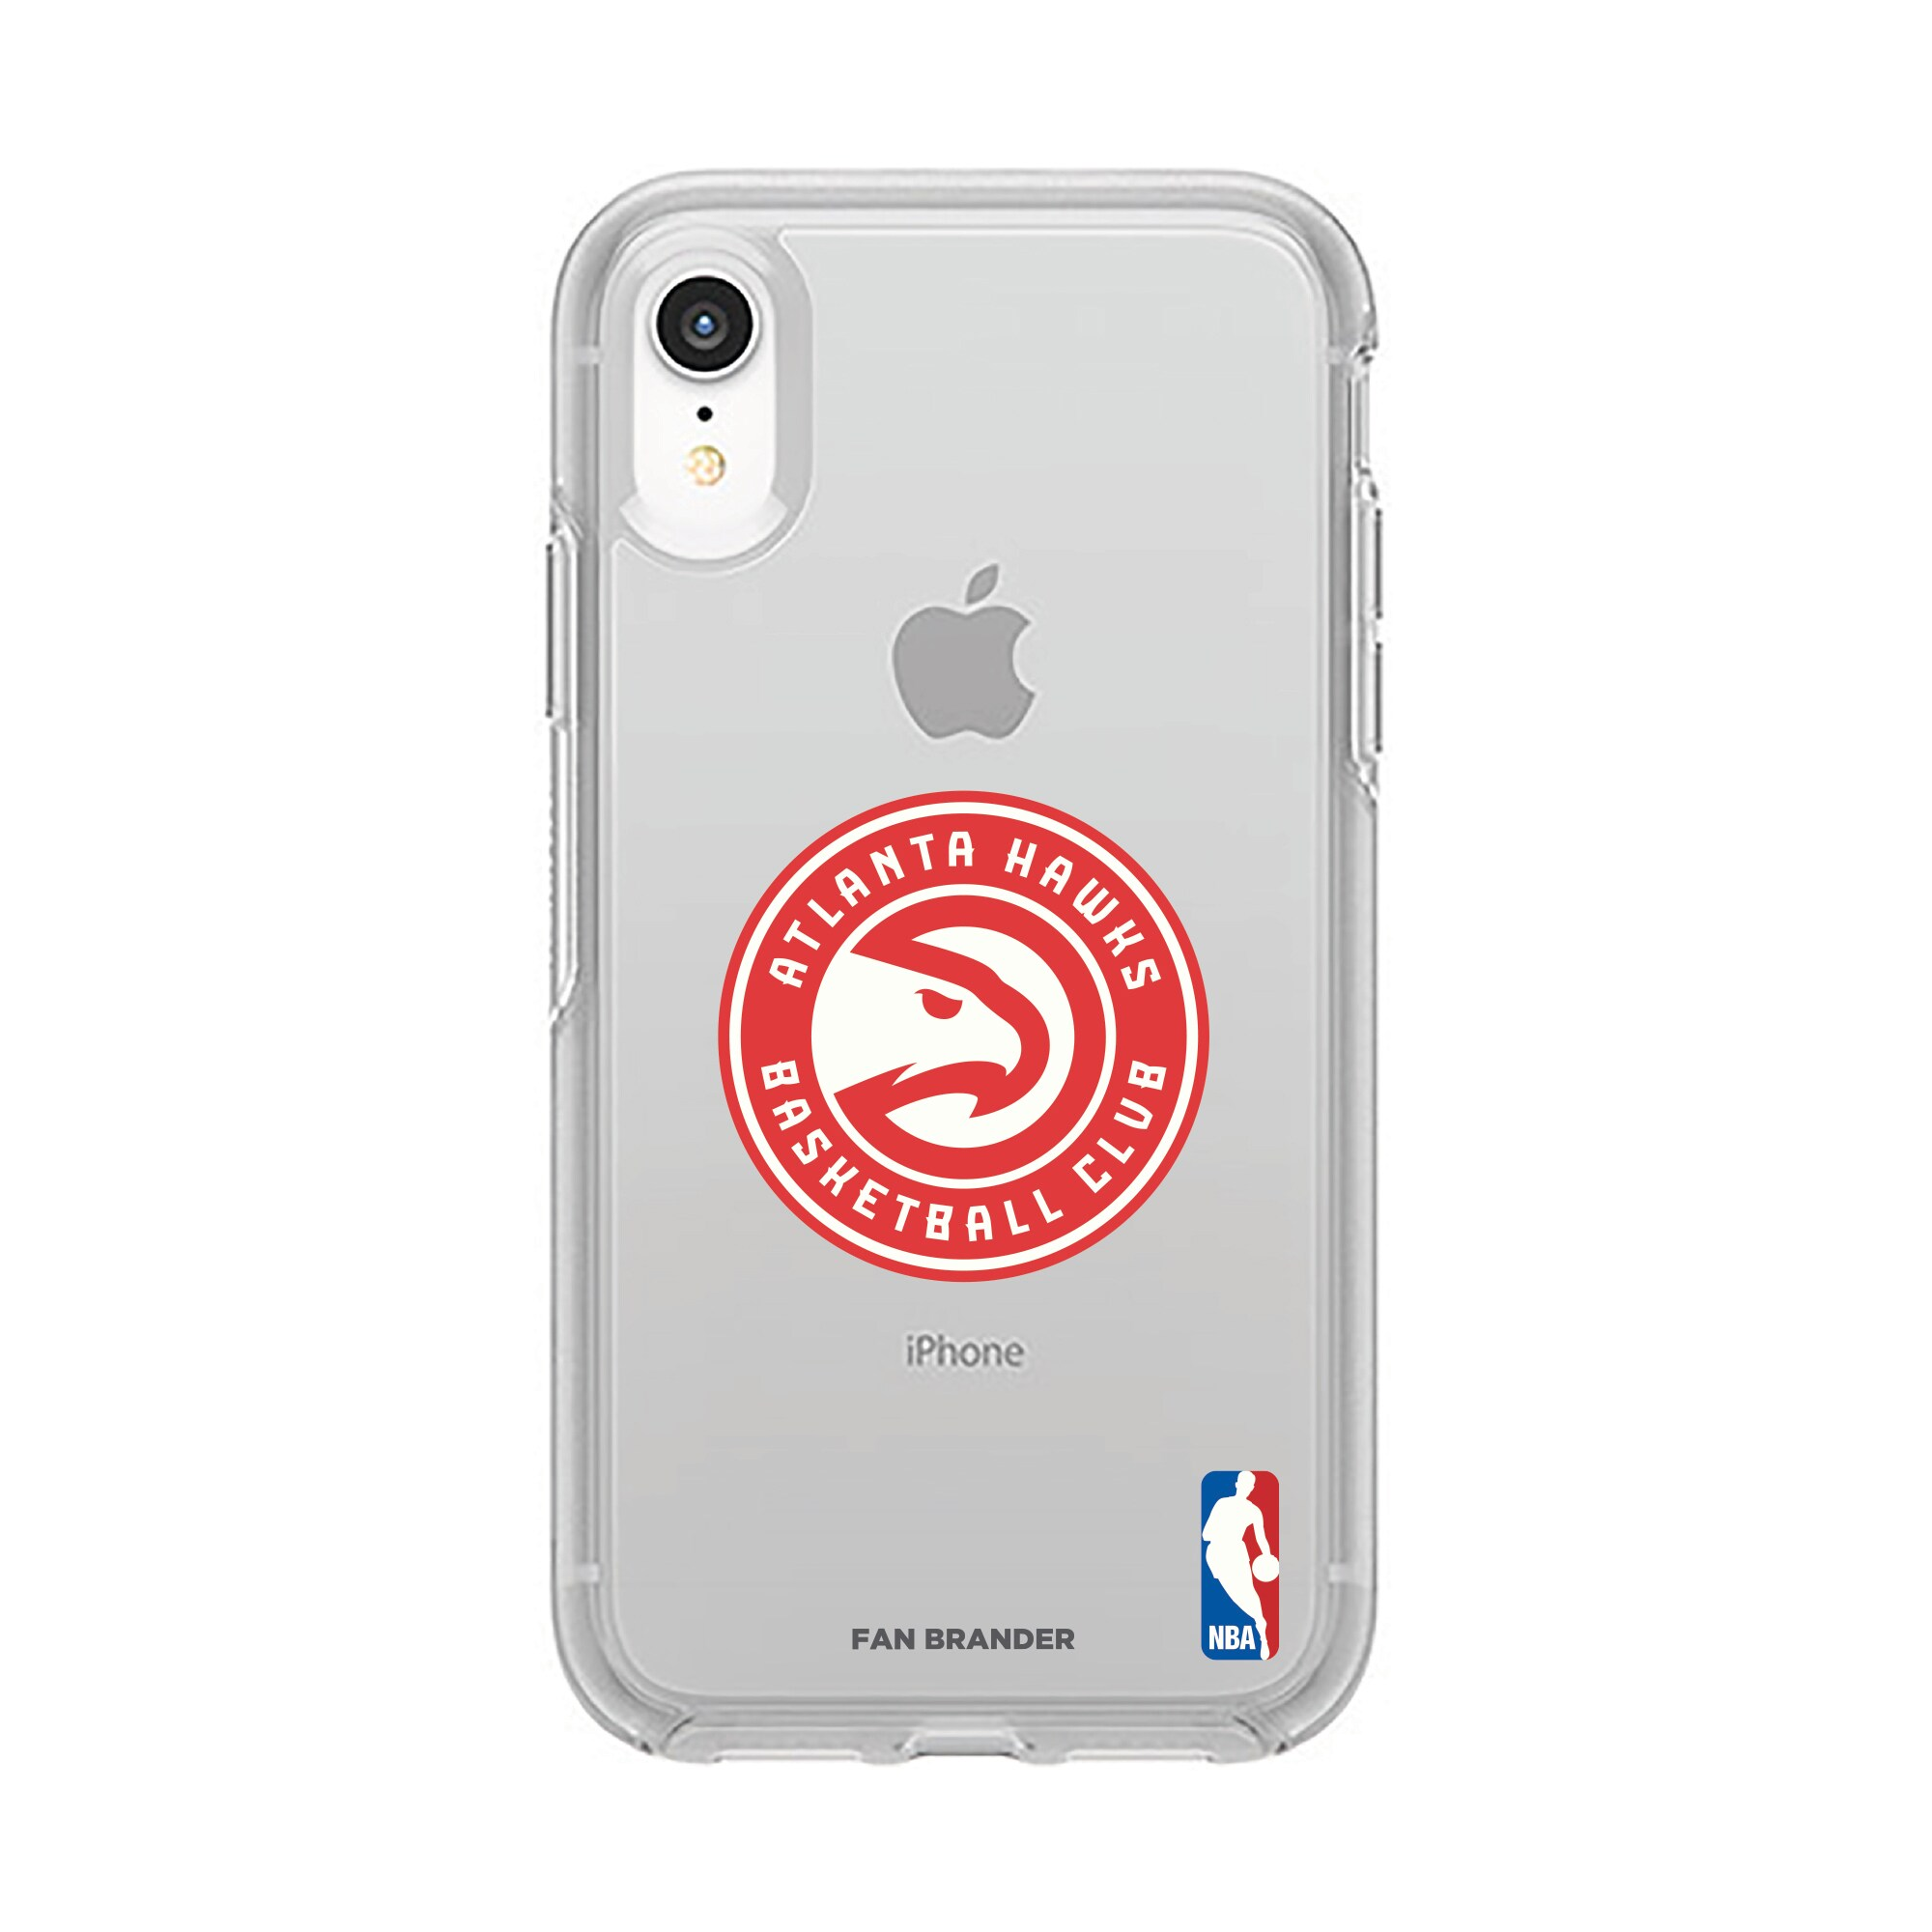 Atlanta Hawks OtterBox Clear Primary Logo iPhone Case